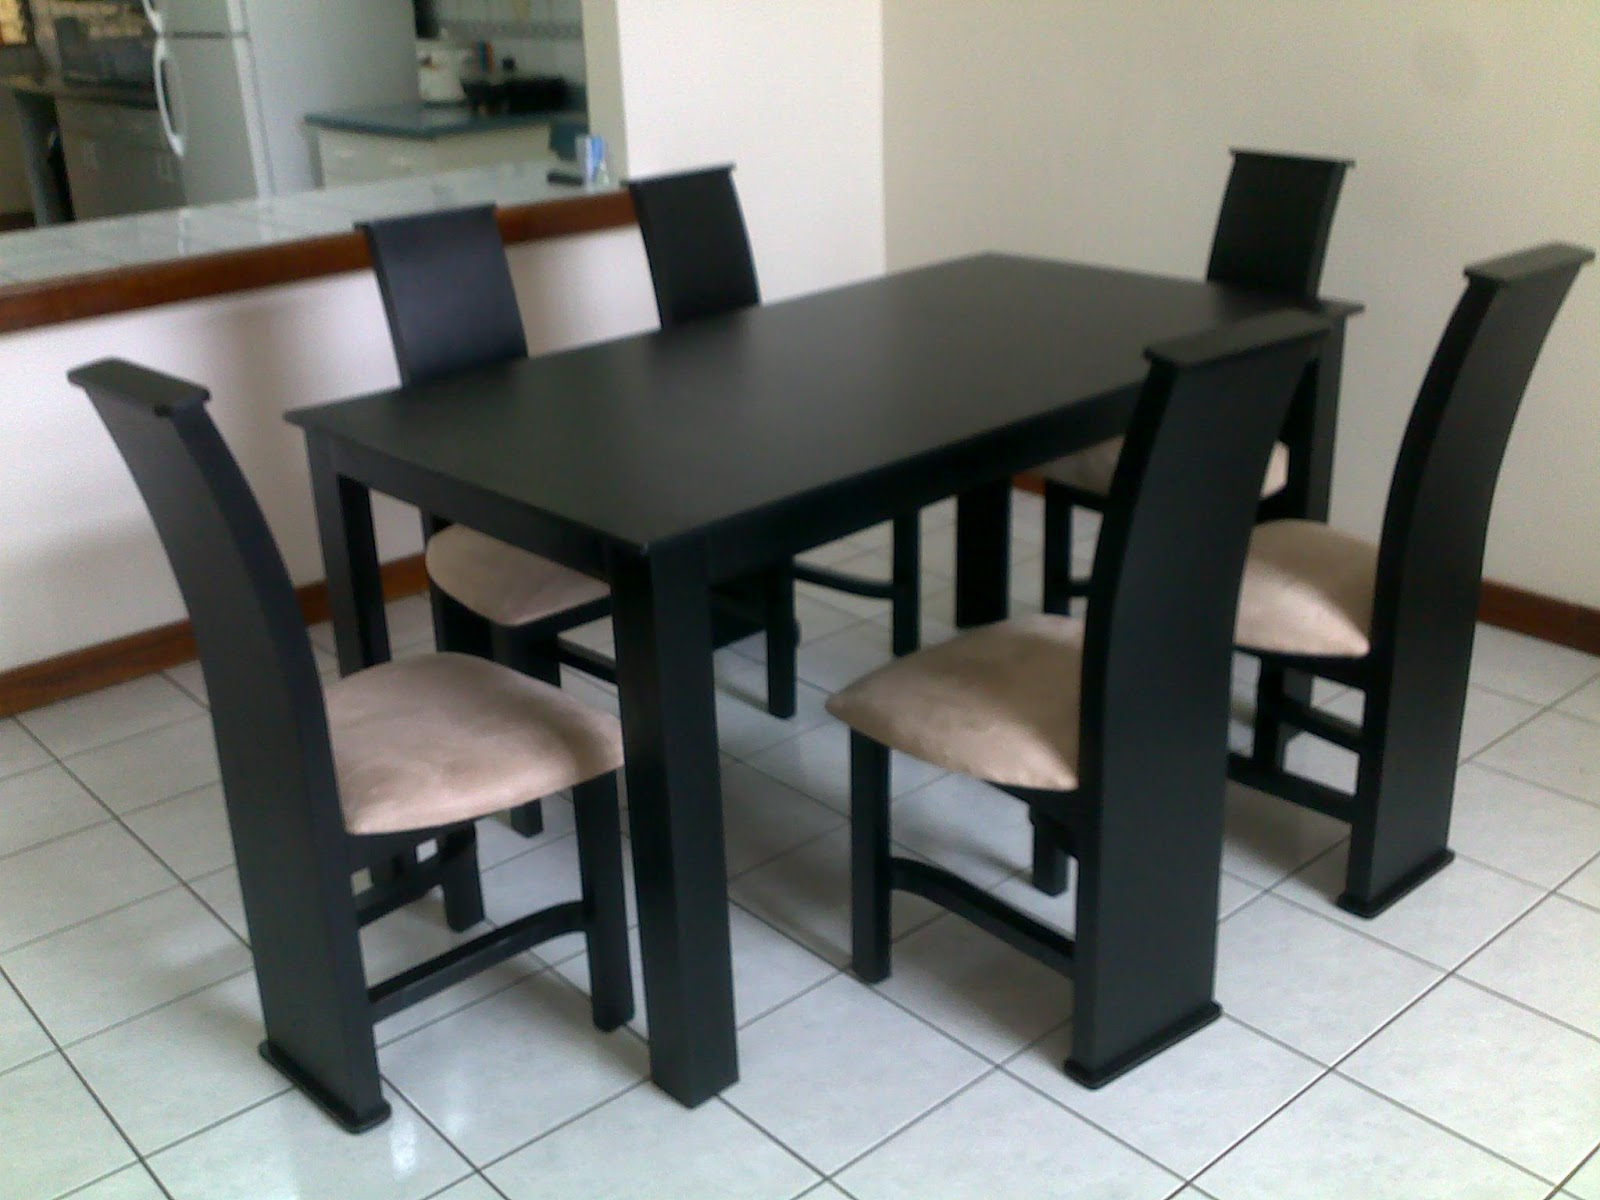 muebles figo comedor seis sillas negro madera de pino chileno On comedor negro